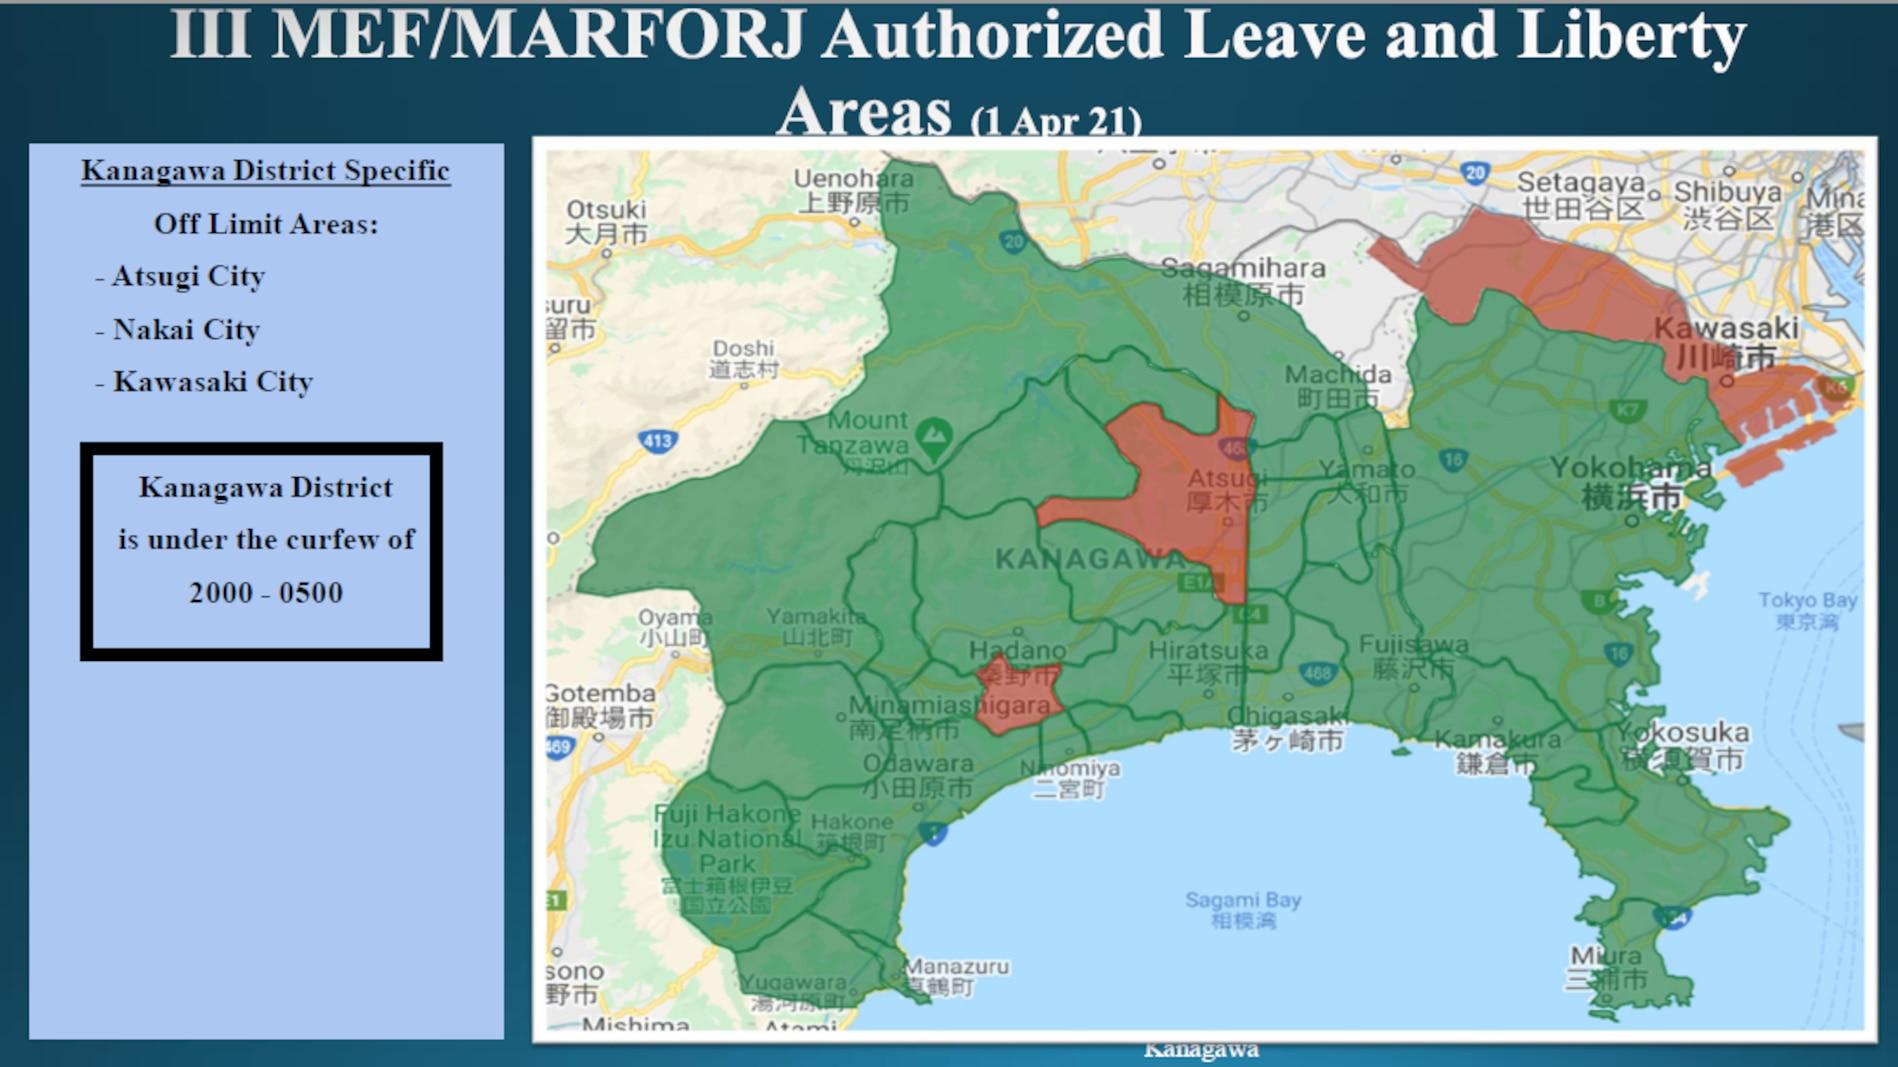 III MEF/MARFORJ Leave and Liberty